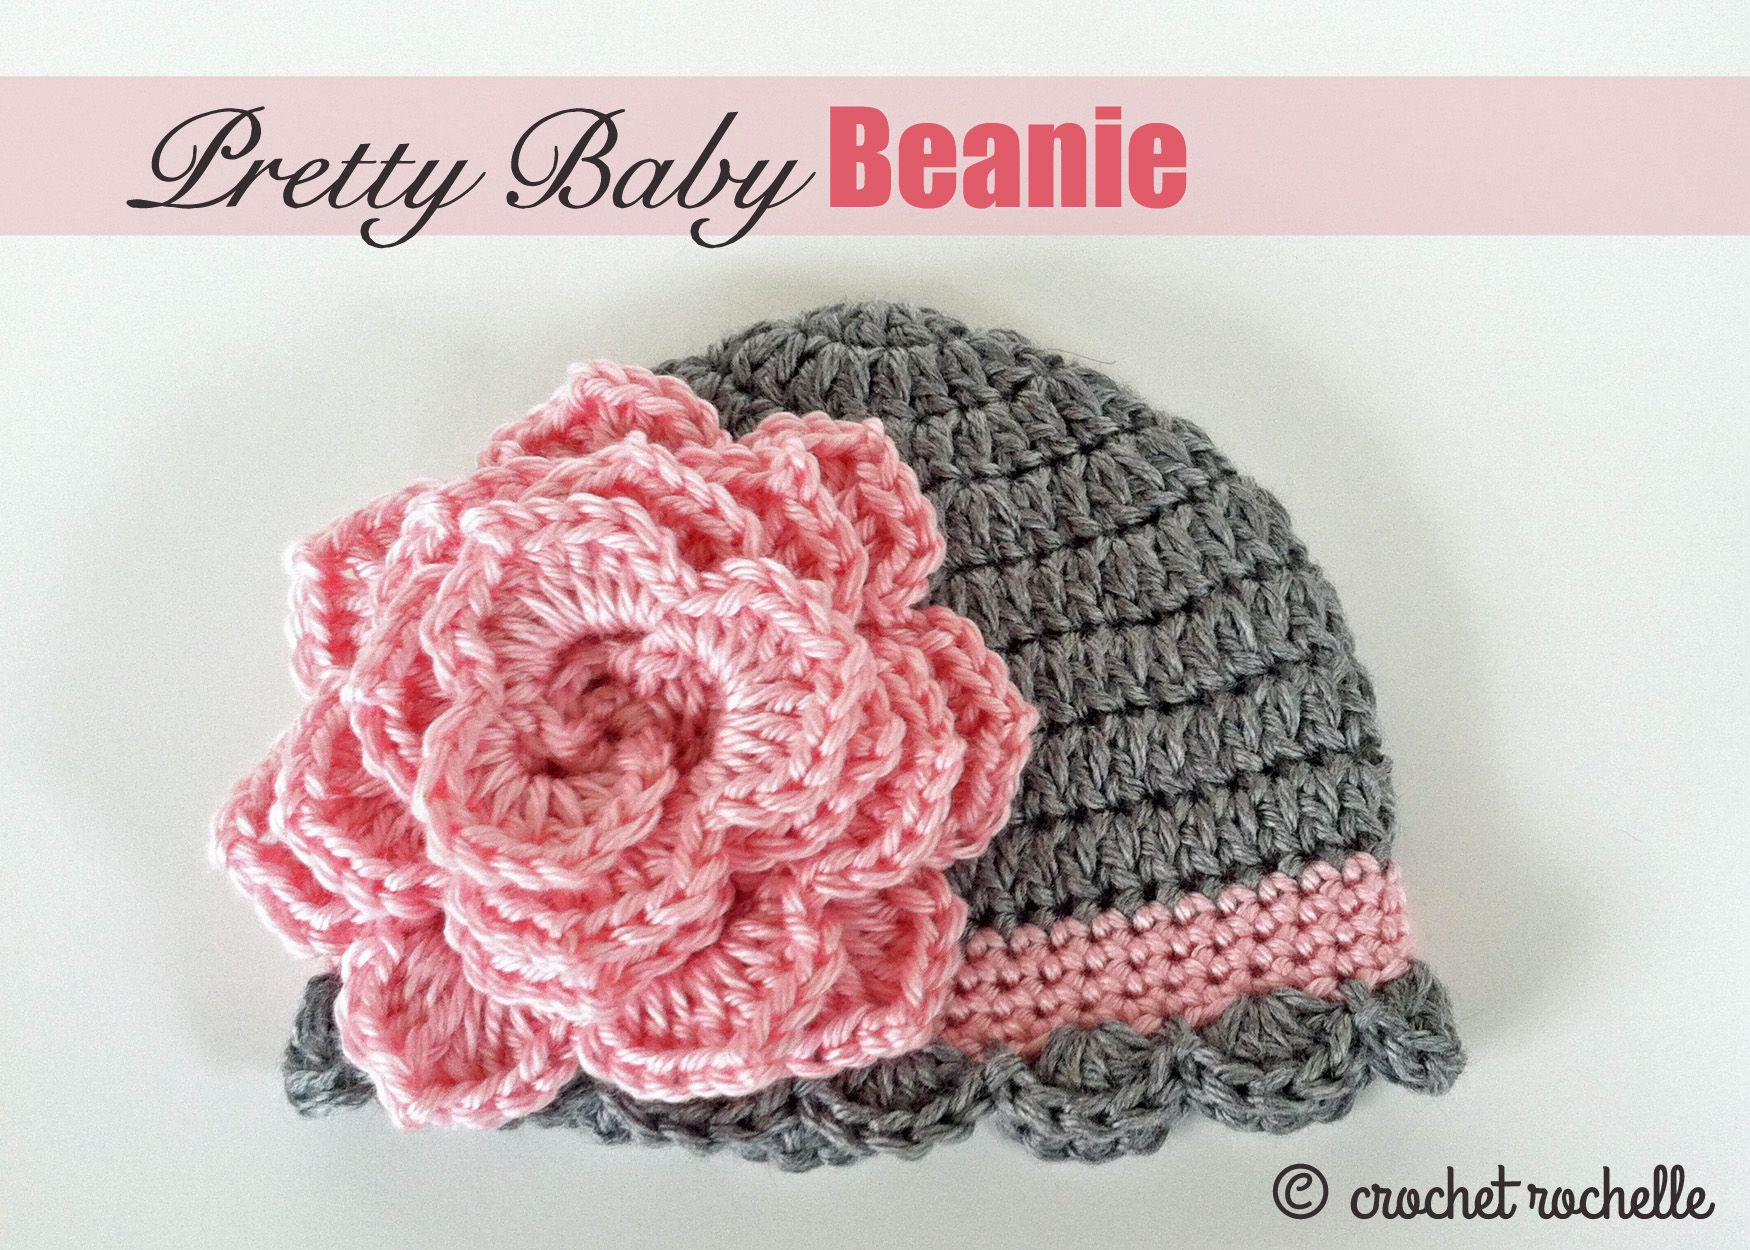 Amy S Crochet Creative Creations Cro chet Pretty Baby Beanie | Dog ...